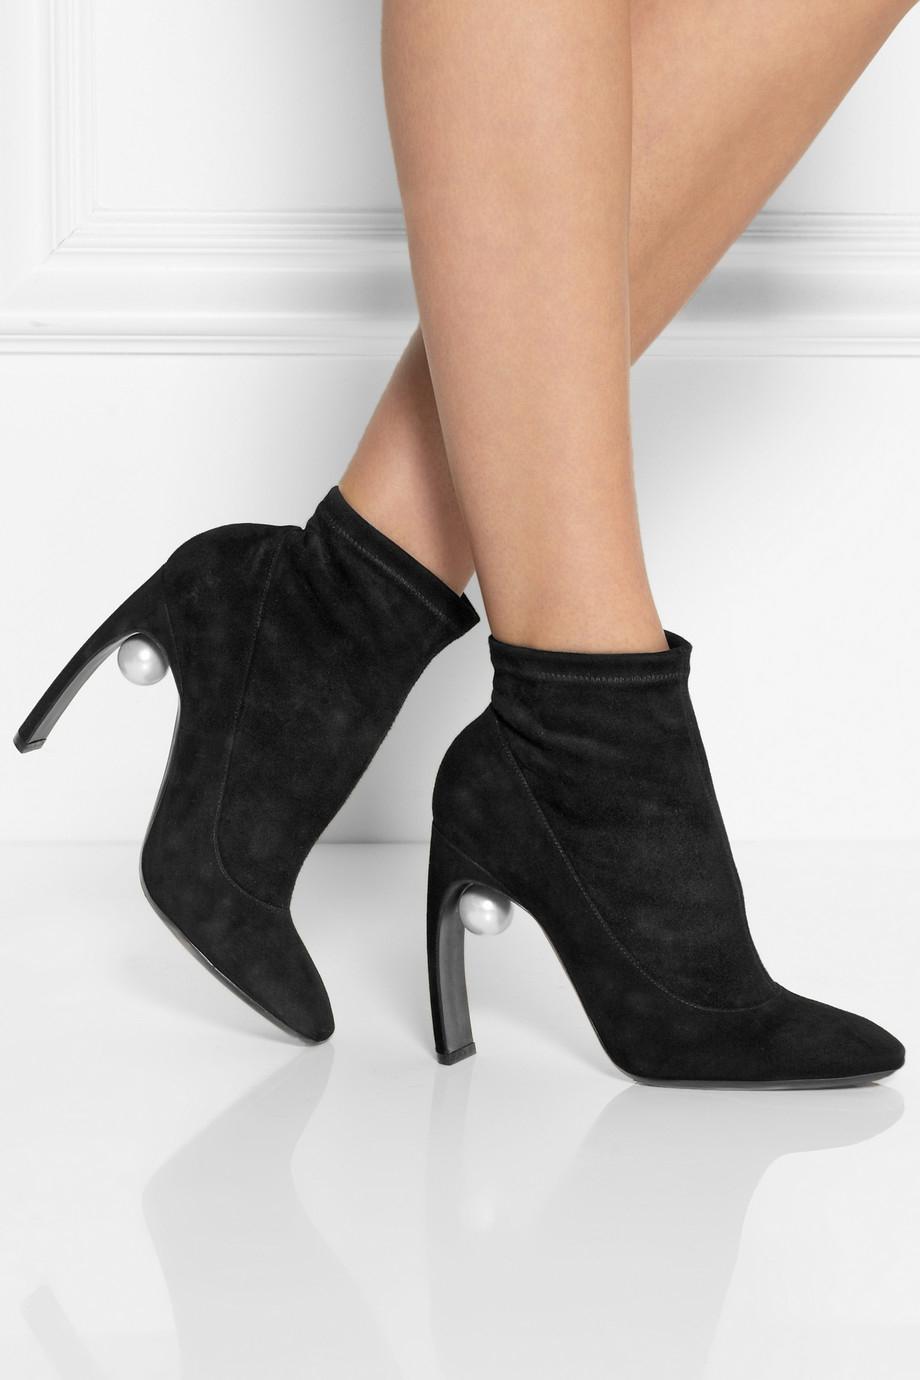 Nicholas Kirkwood Embellished Ankle Boots buy cheap fake EsuzKdPh